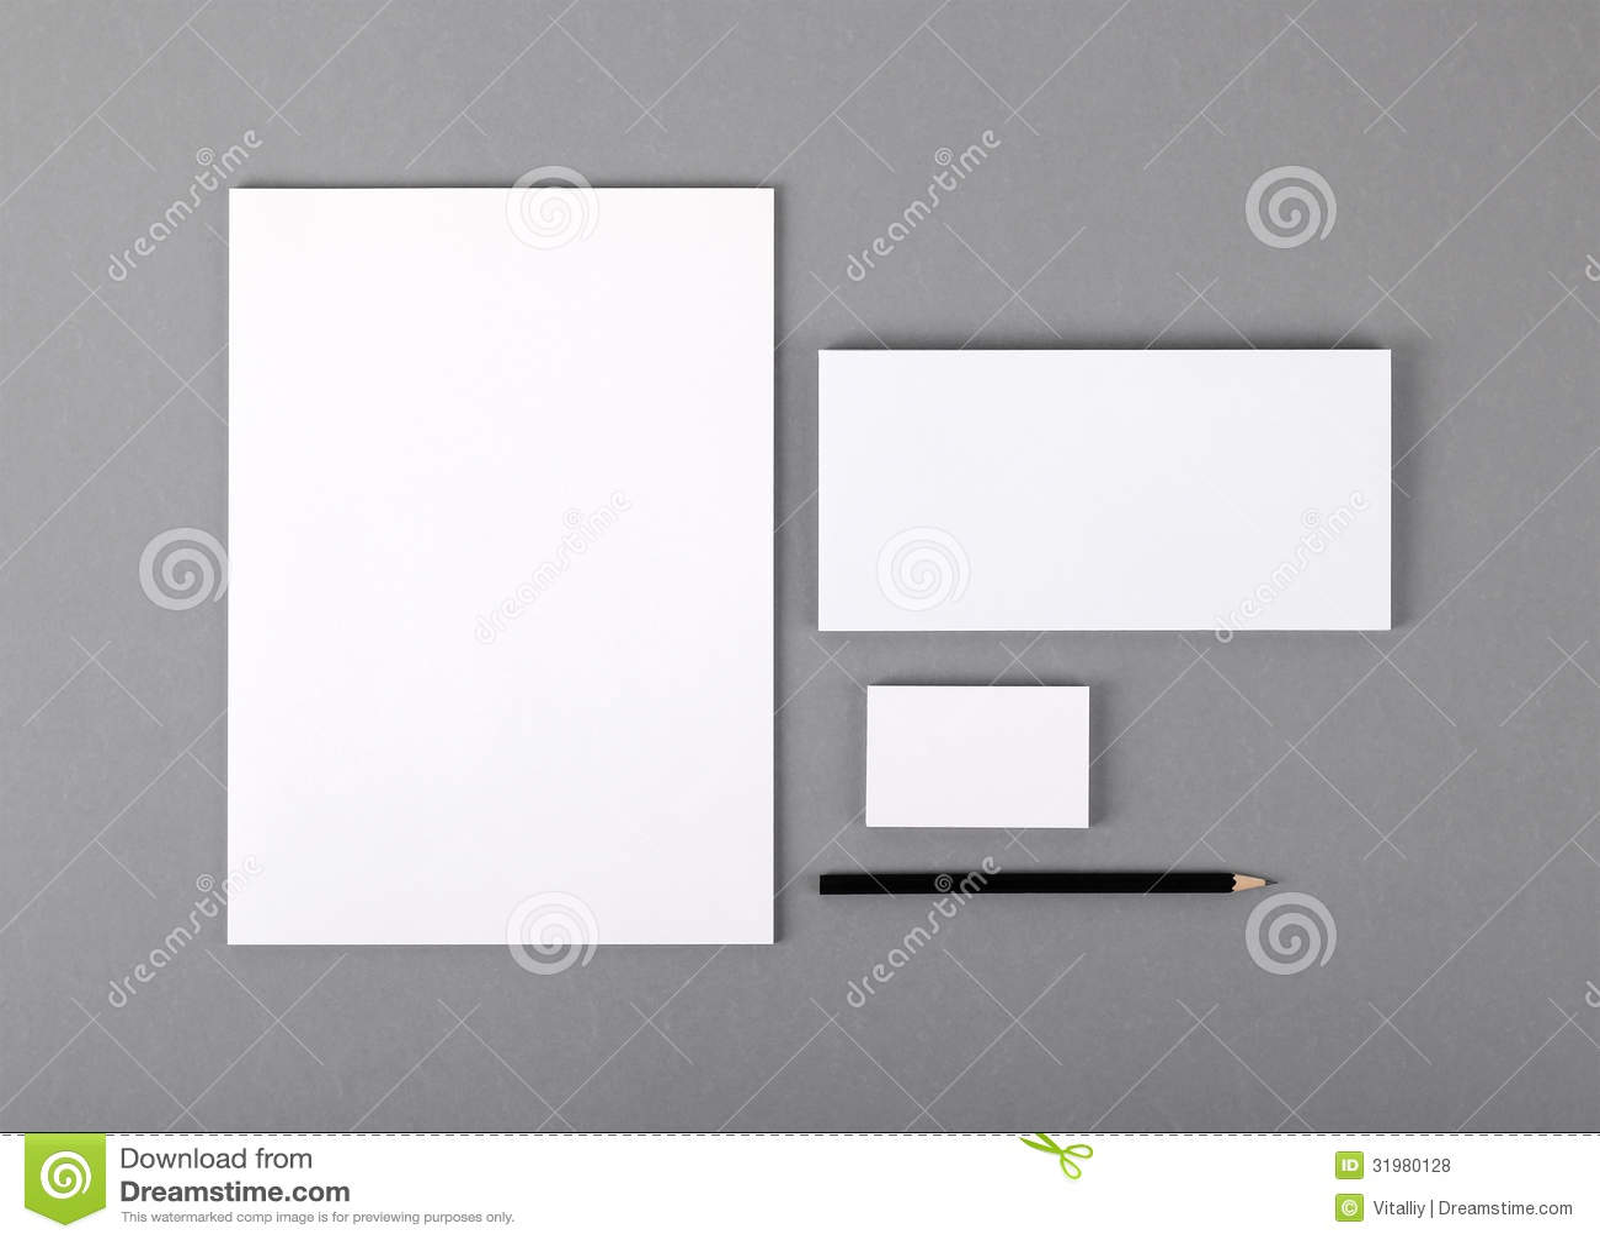 Blank Basic Stationery. Letterhead Flat, Business Card, Envelope Royalty Free Stock Photos